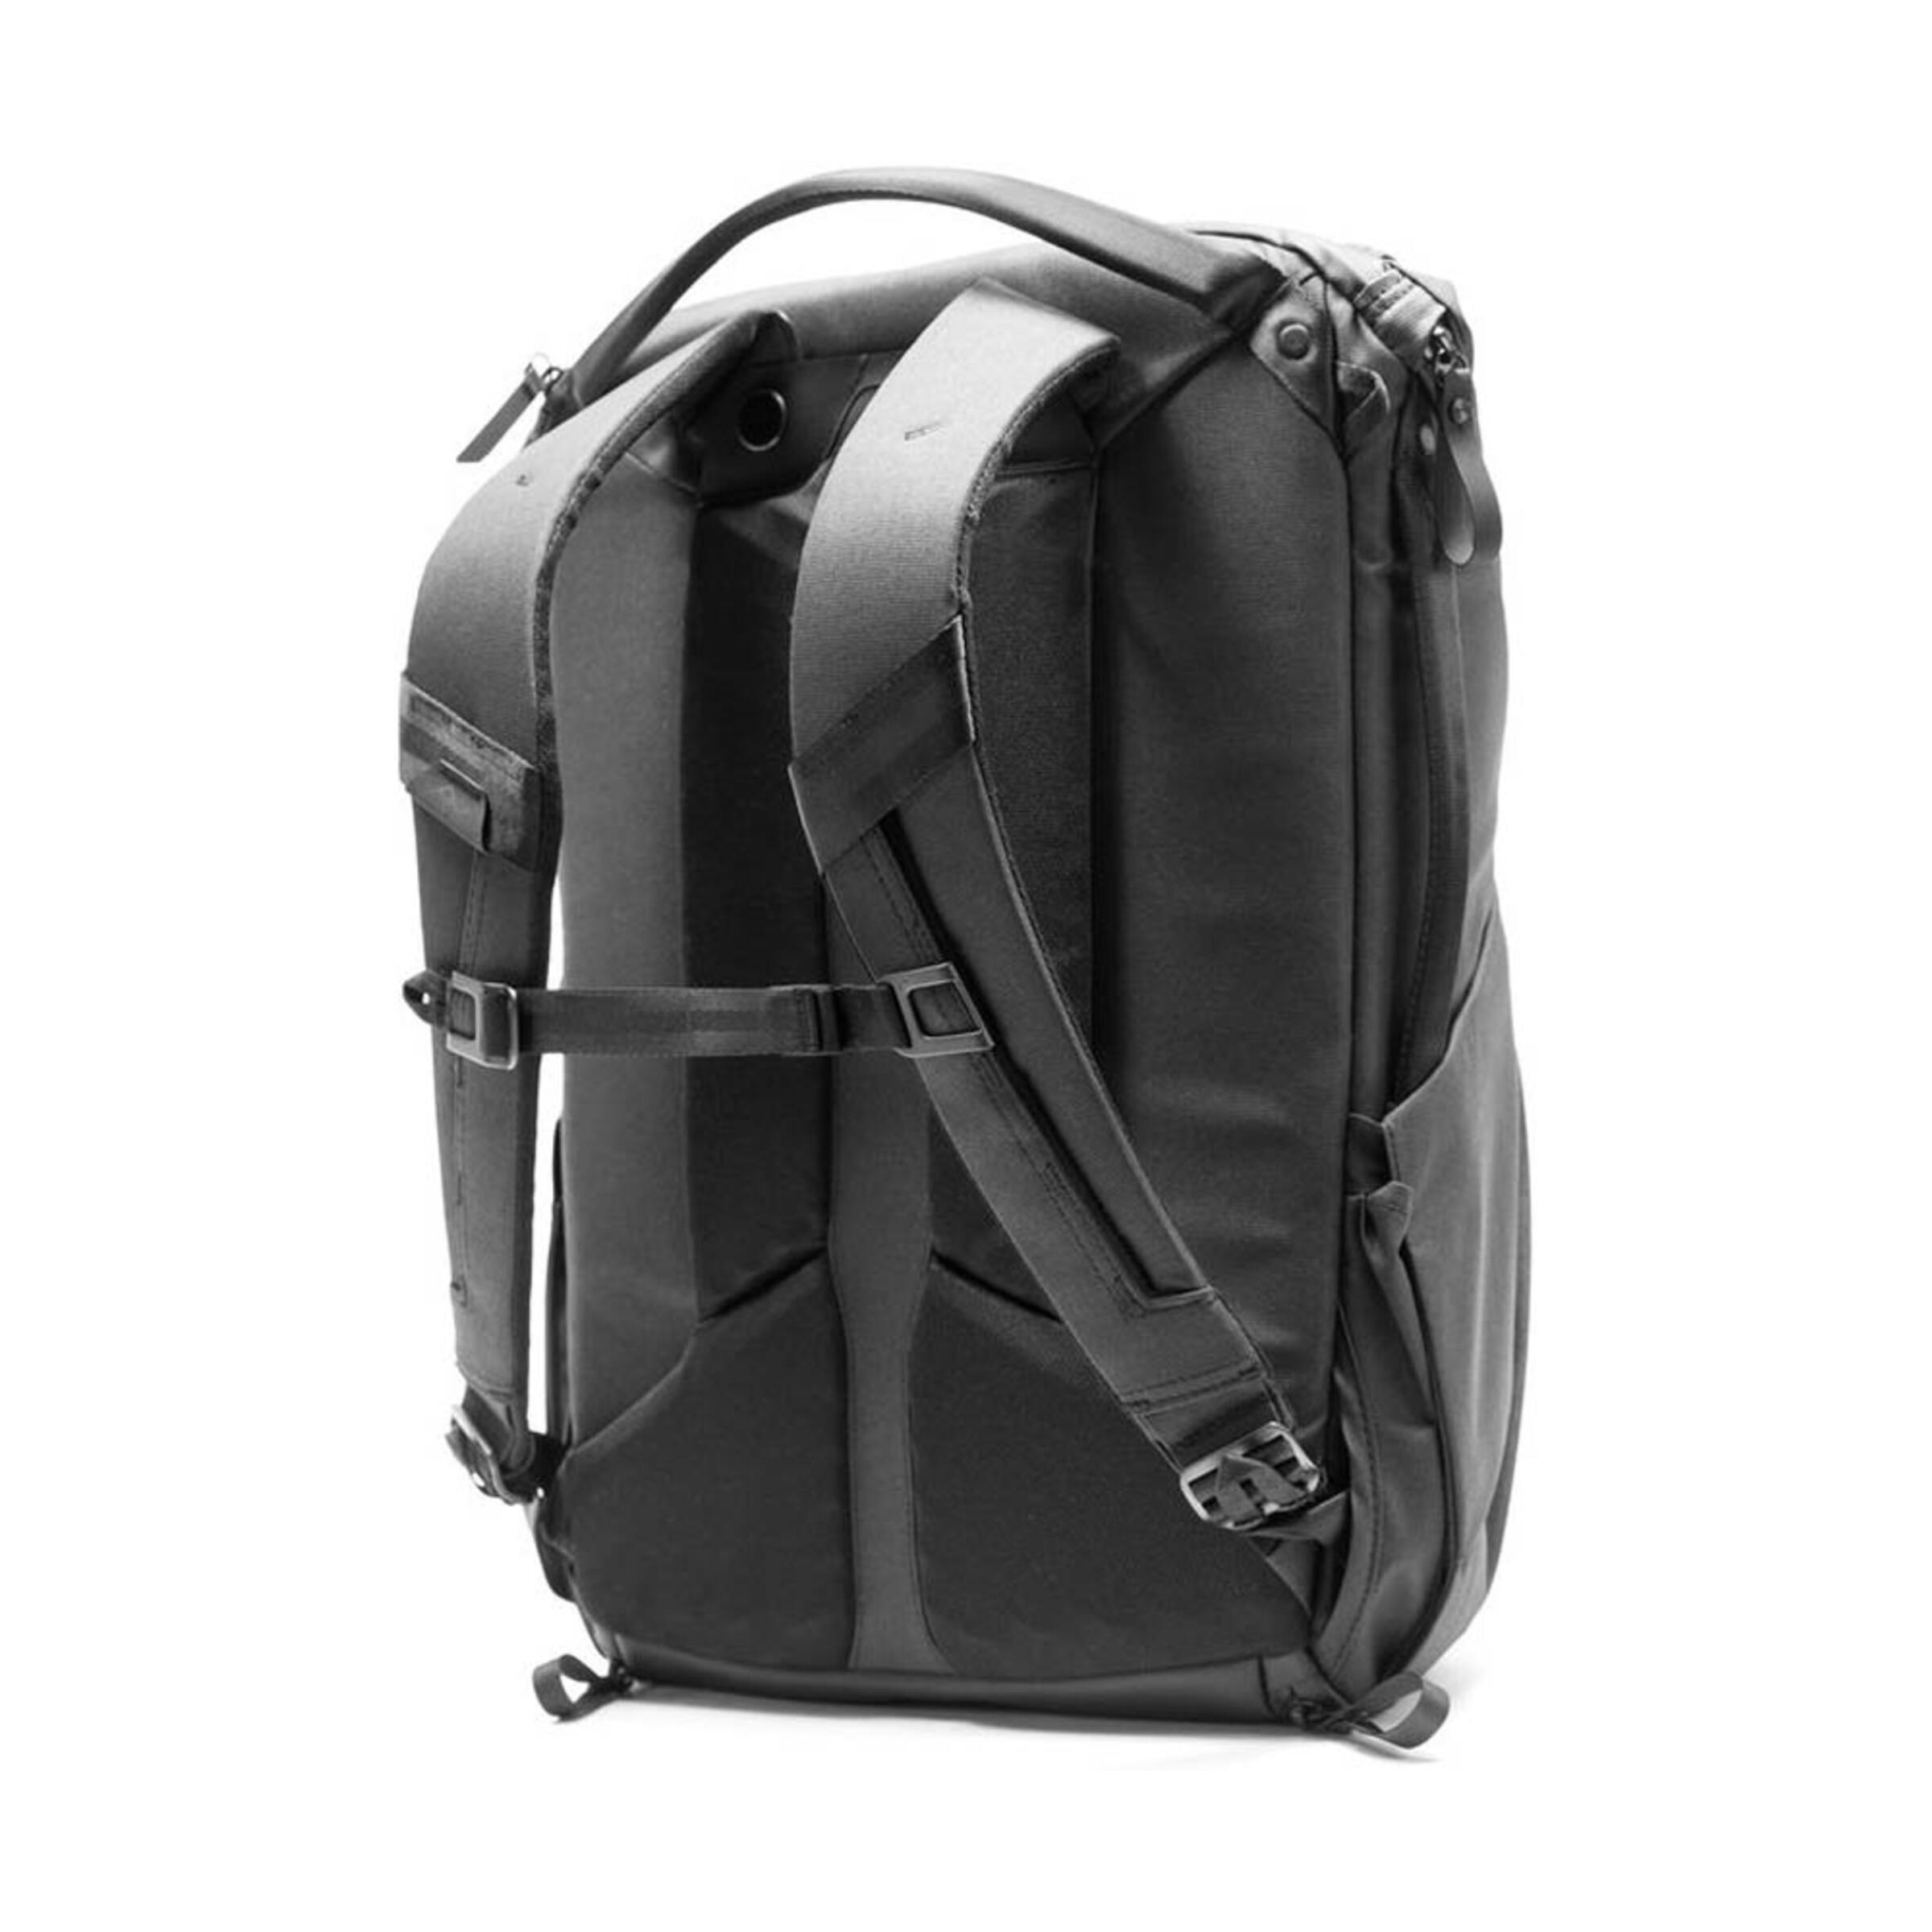 Peak Design Everyday Backpack 30L : Schwarz